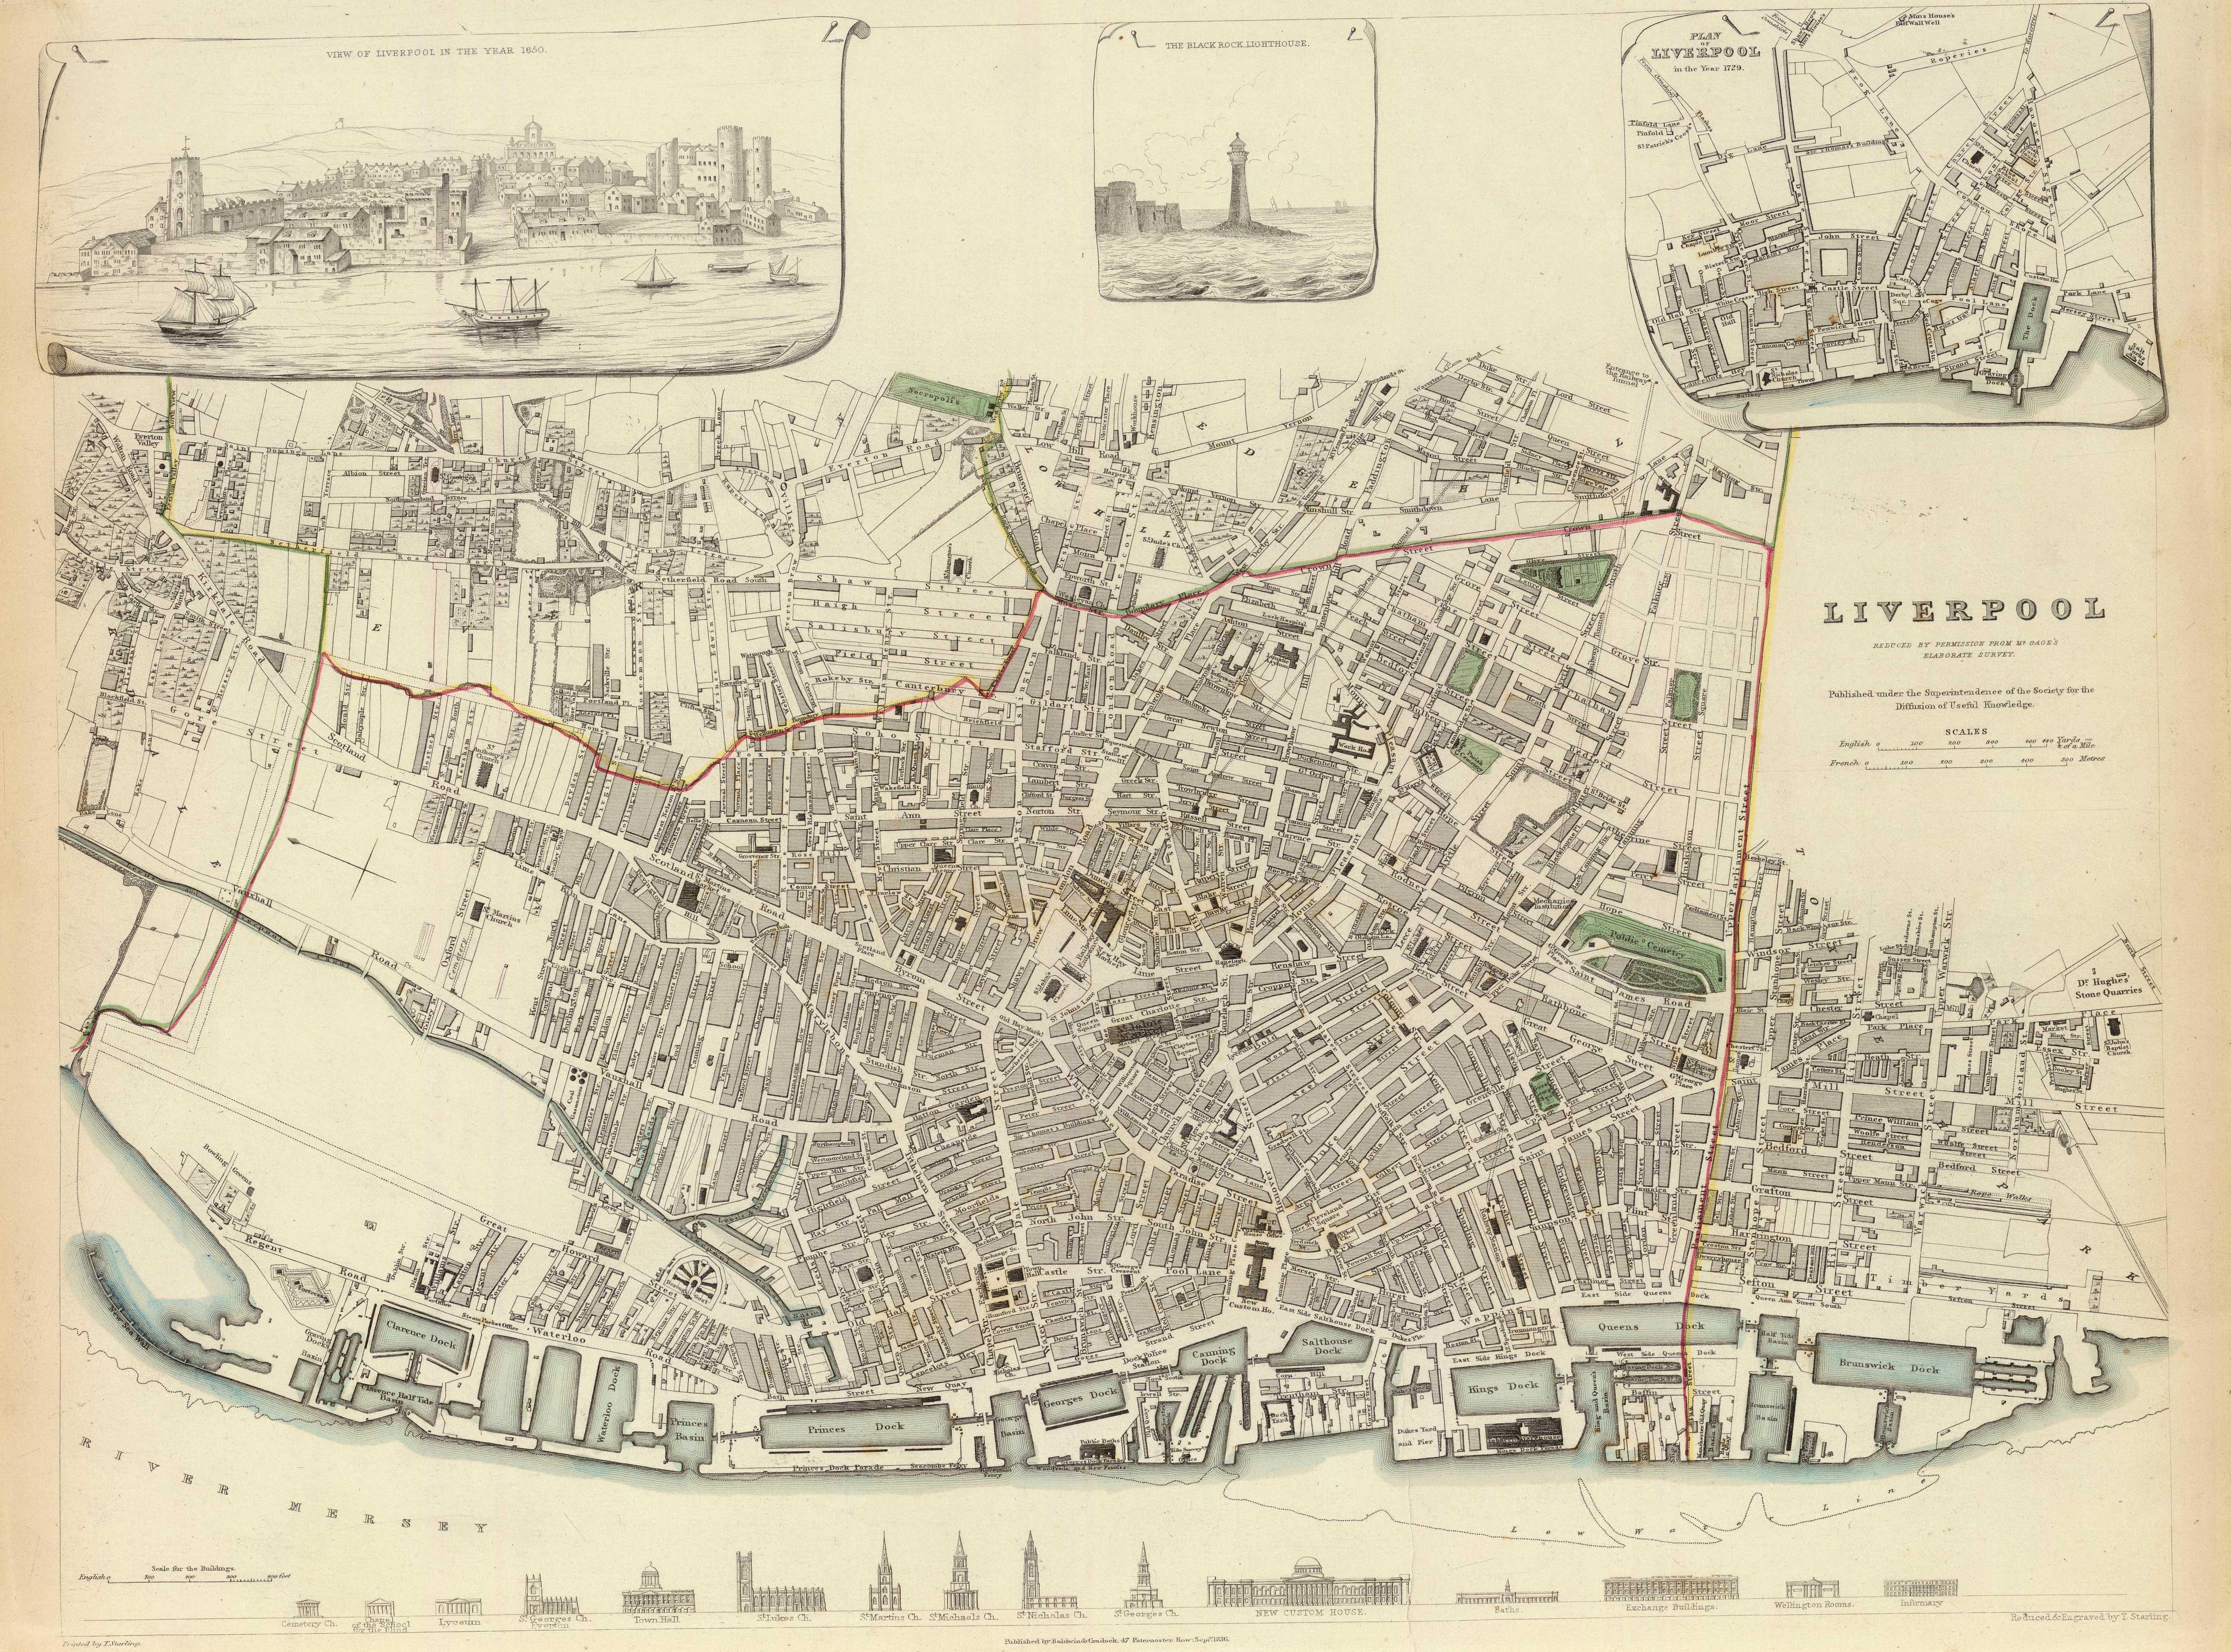 File:Liverpool 1836.jpg